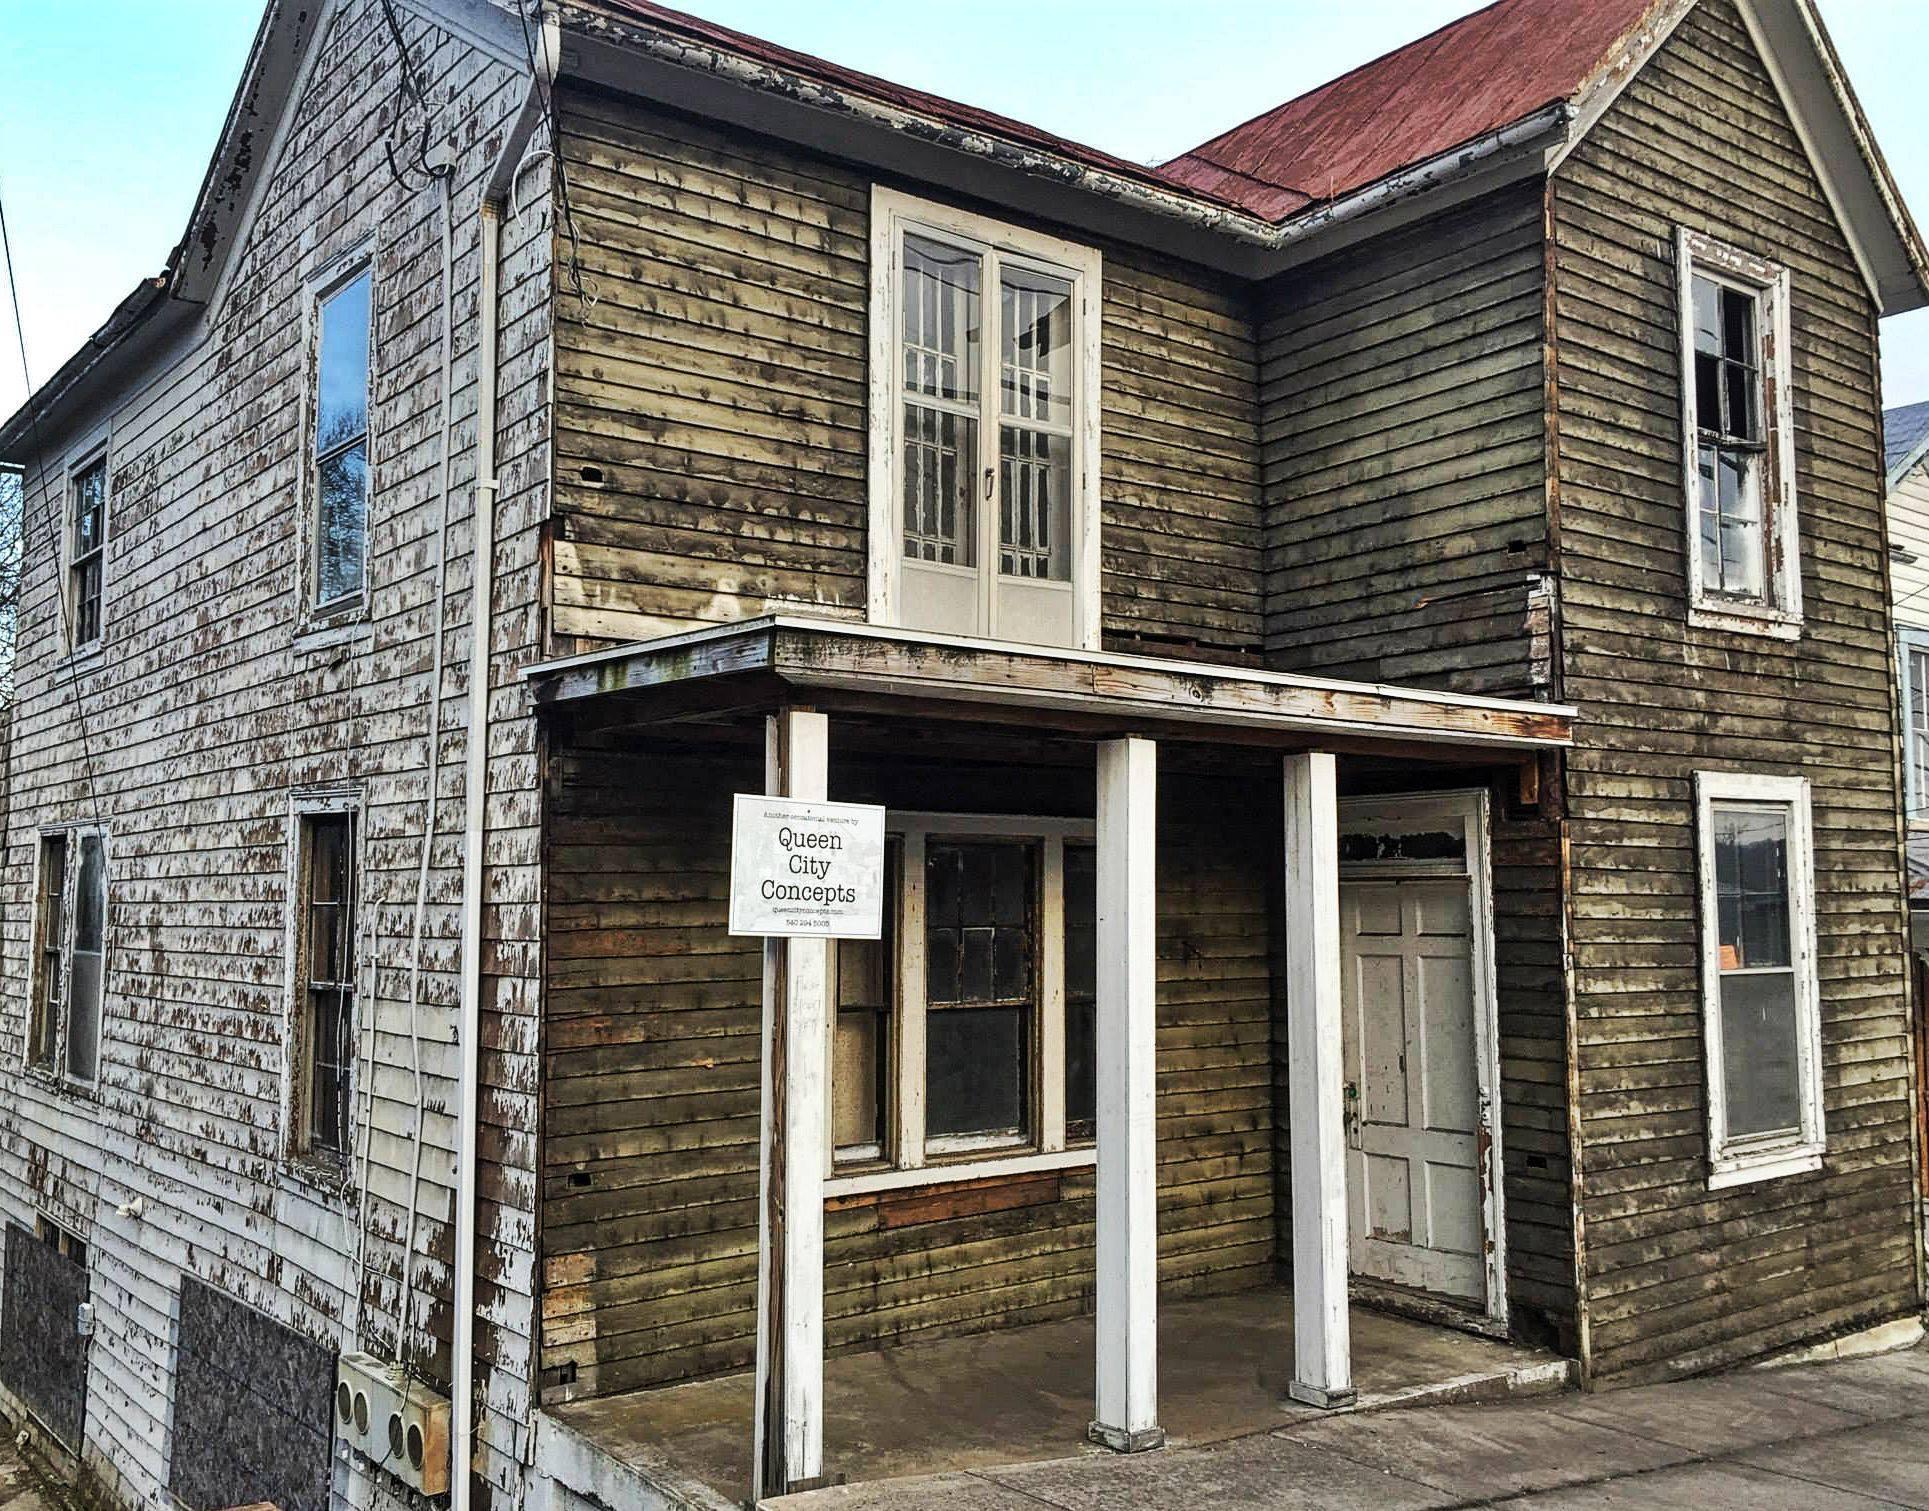 The Landmark pre-restoration: exterior